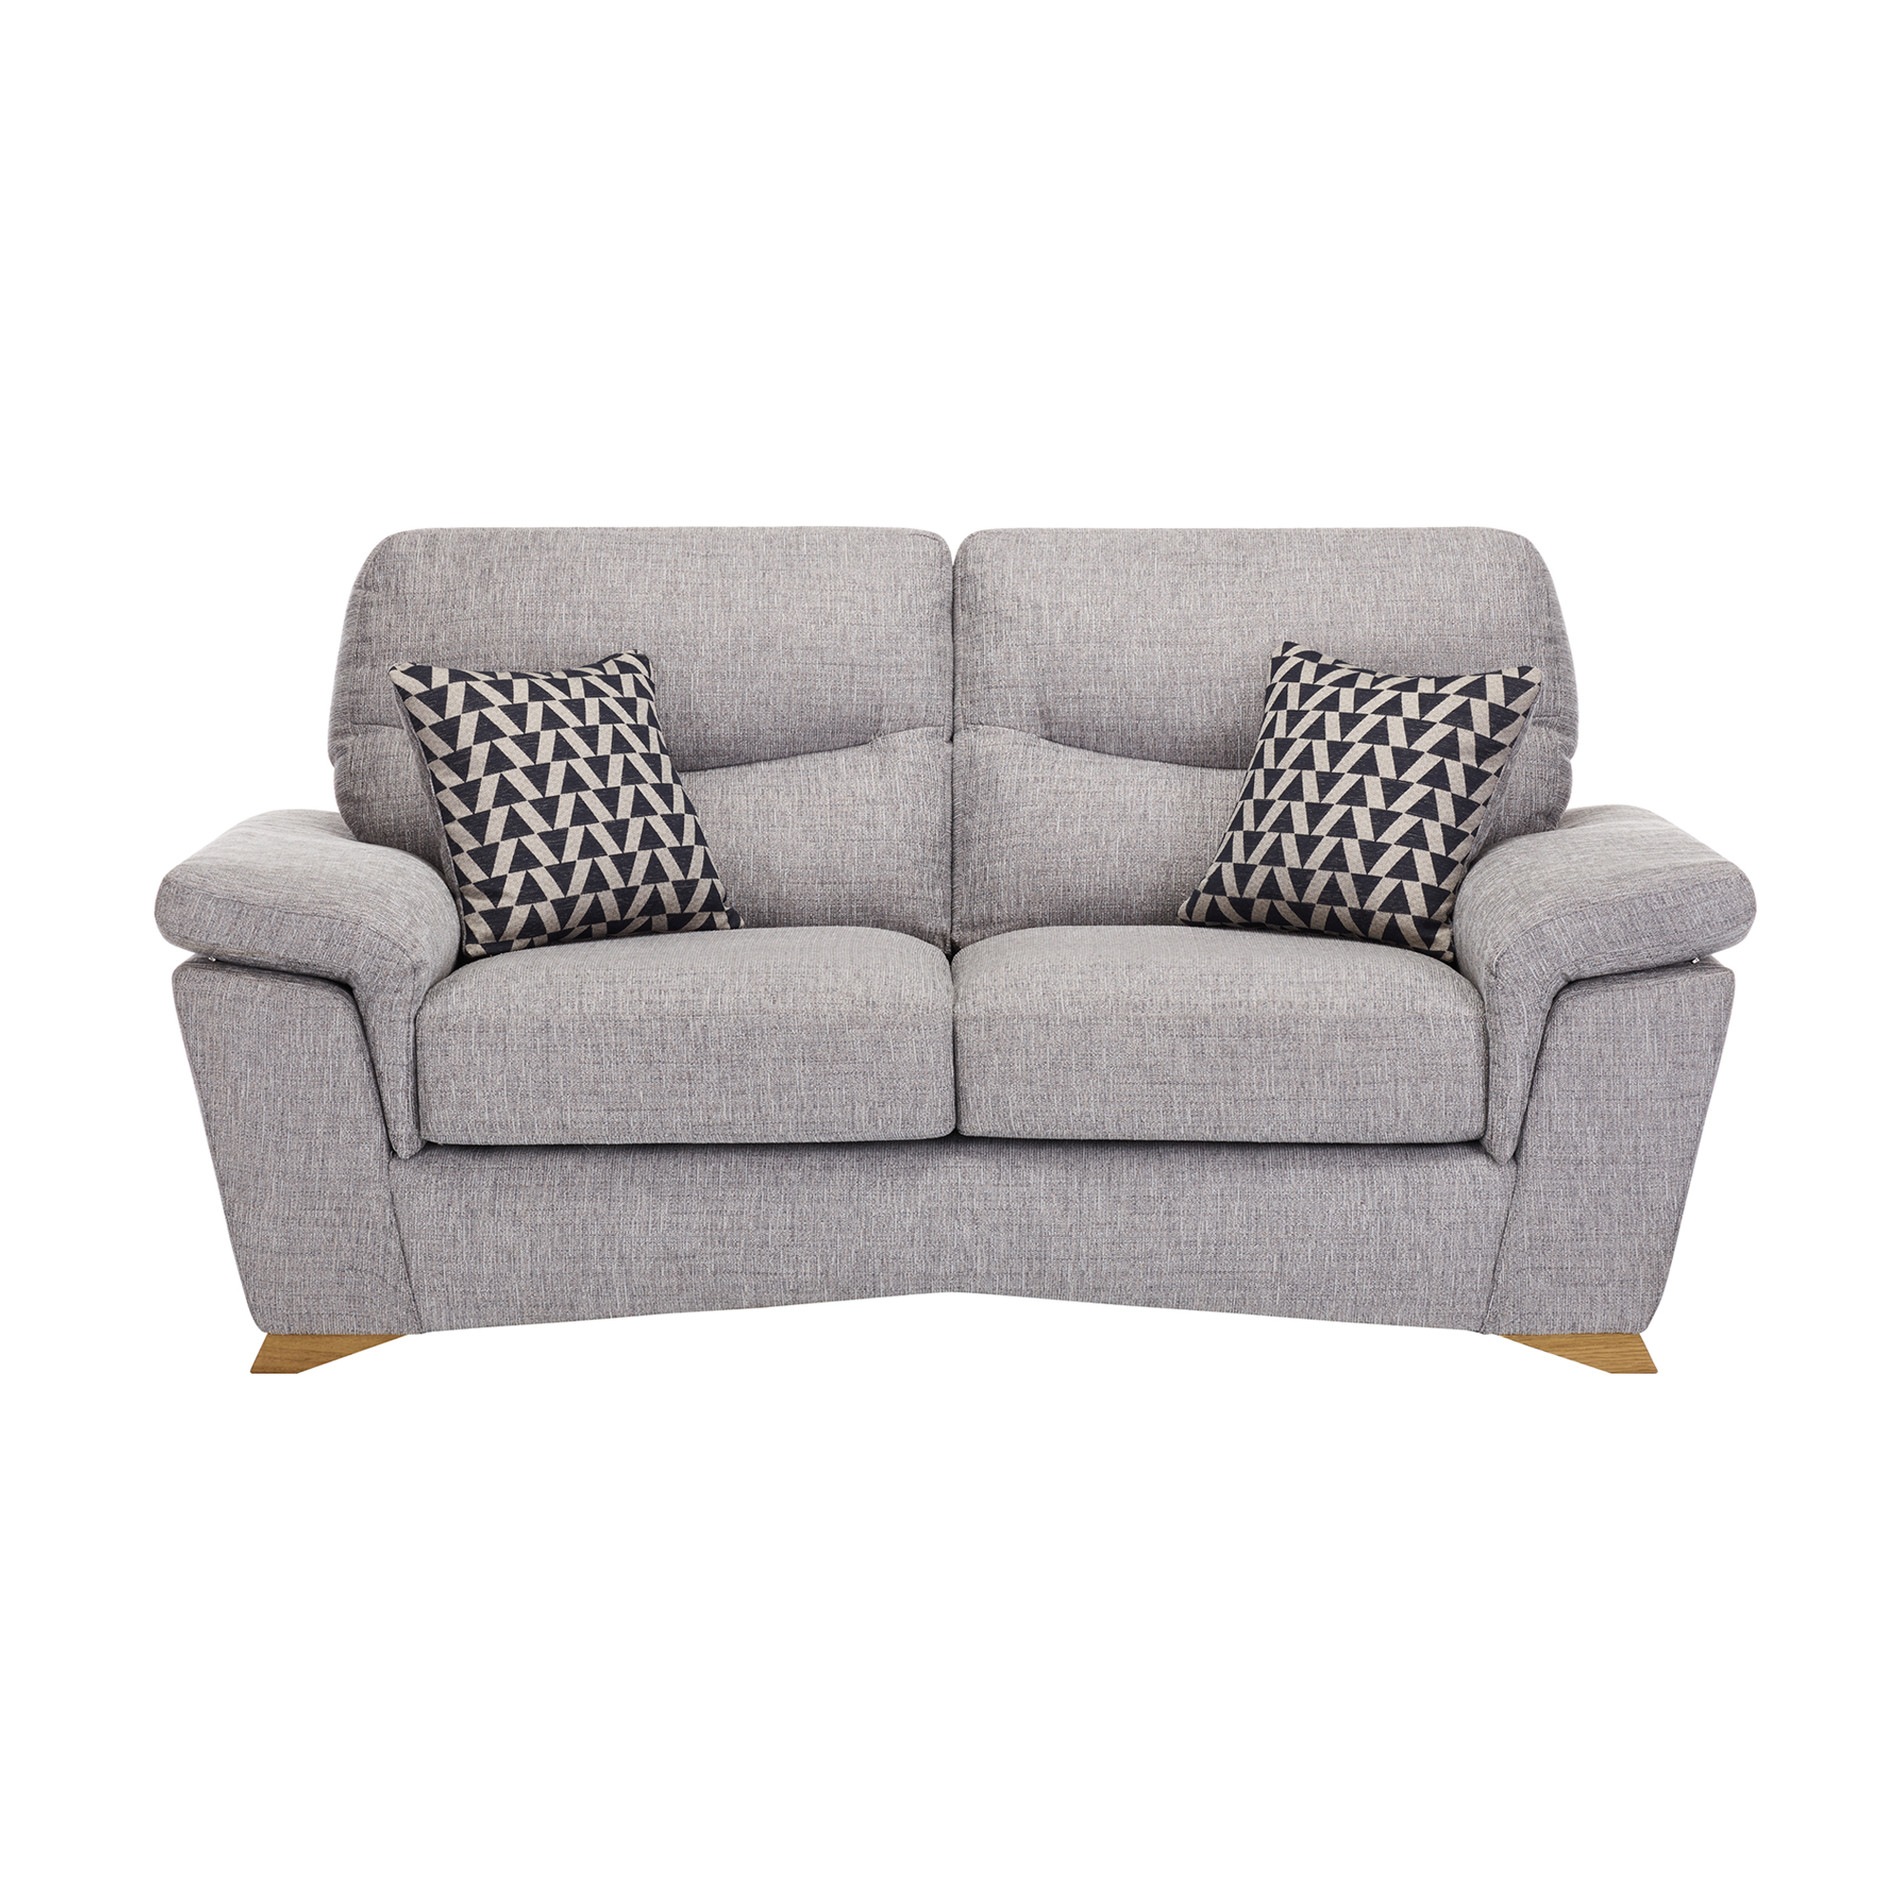 Oak Furniture Land Sofas Instafurnitures